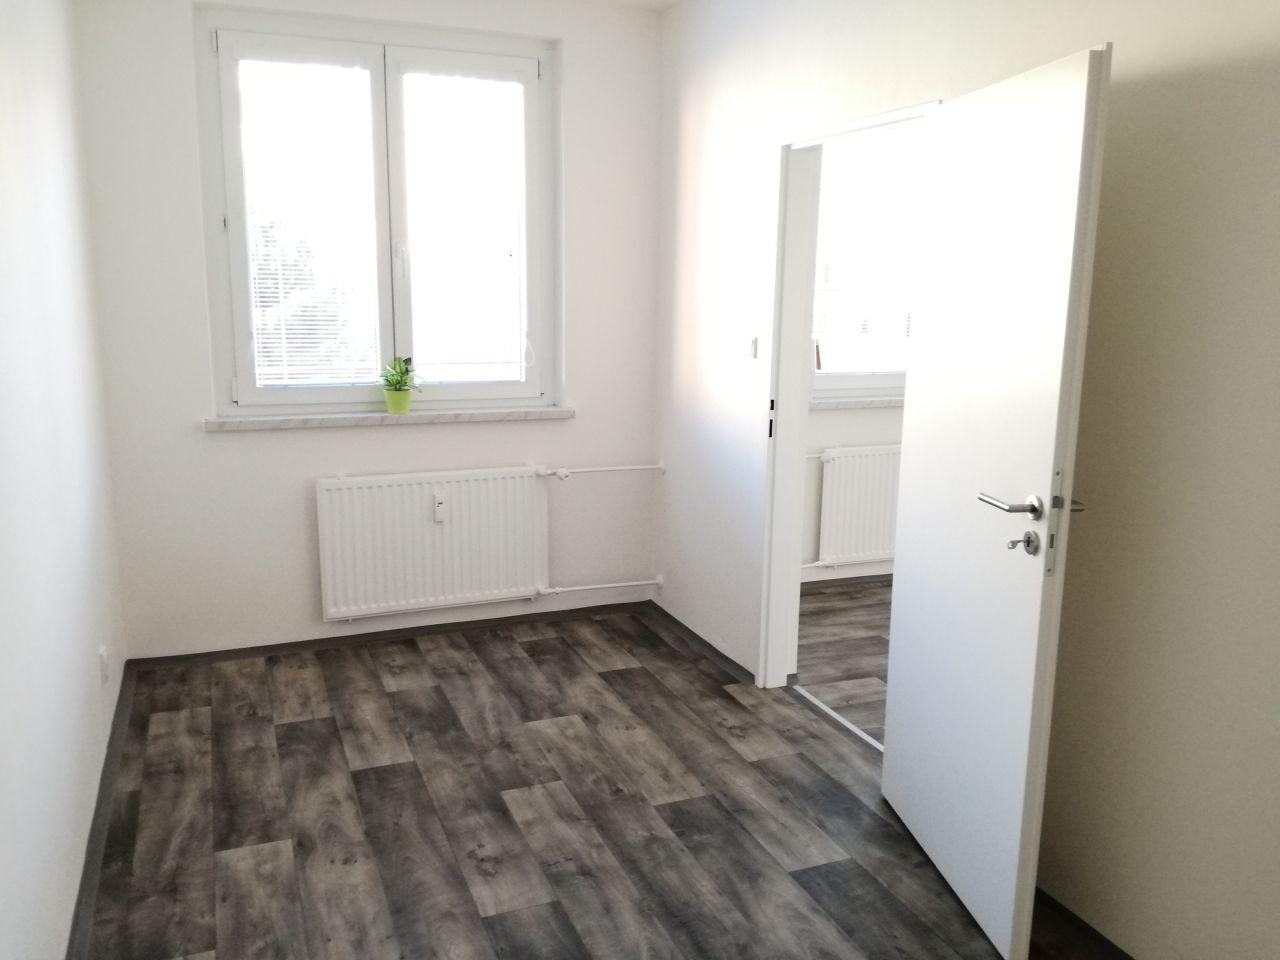 Pronájem bytu 2+1 44 m2, ul. Emanuela Podgorného 90/6, Ostrava - Dubina